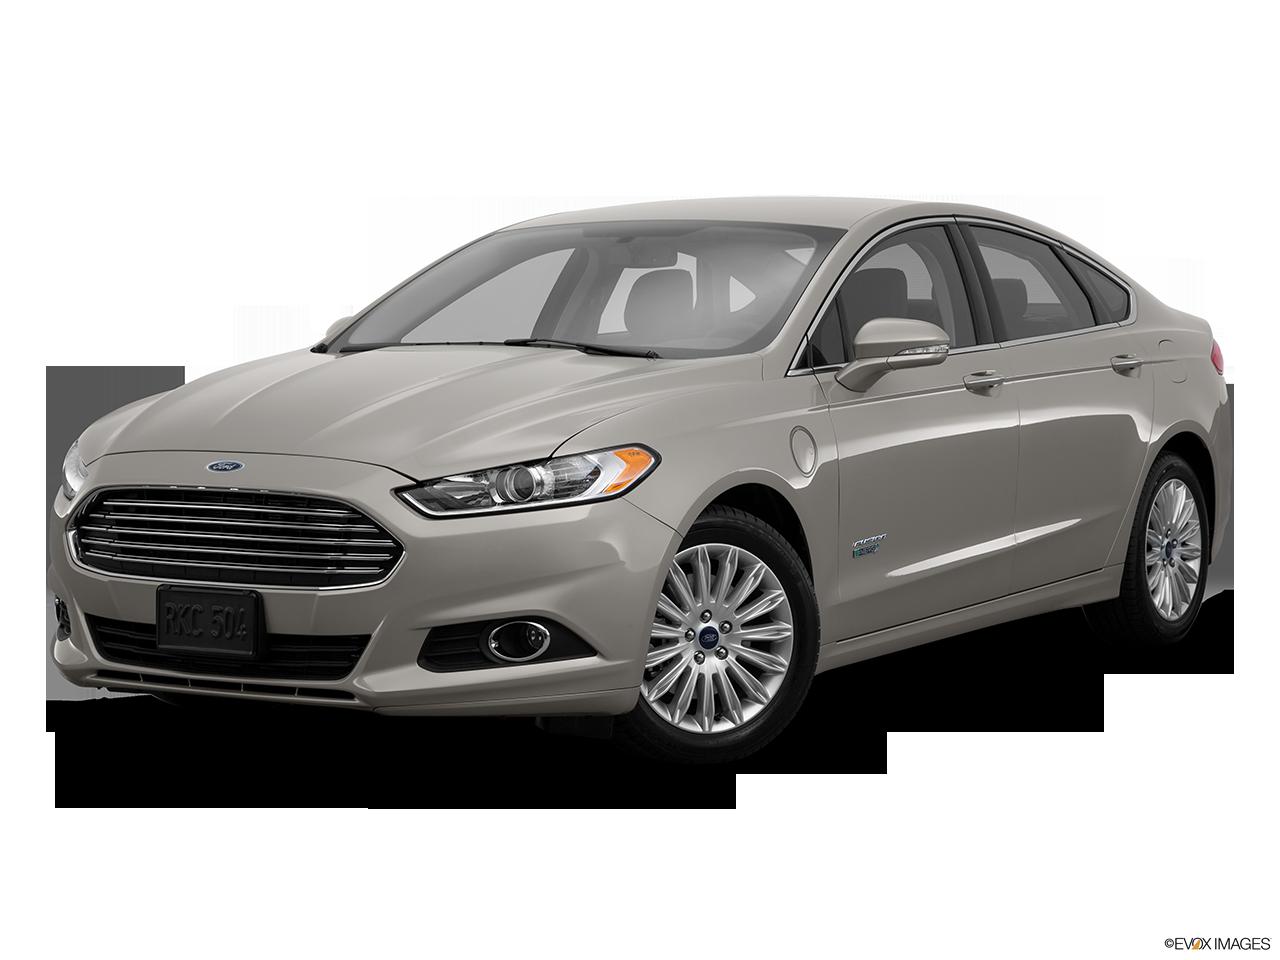 Gosch ford hemet new ford dealership in hemet ca 92545 for Ford motor company pre employment test